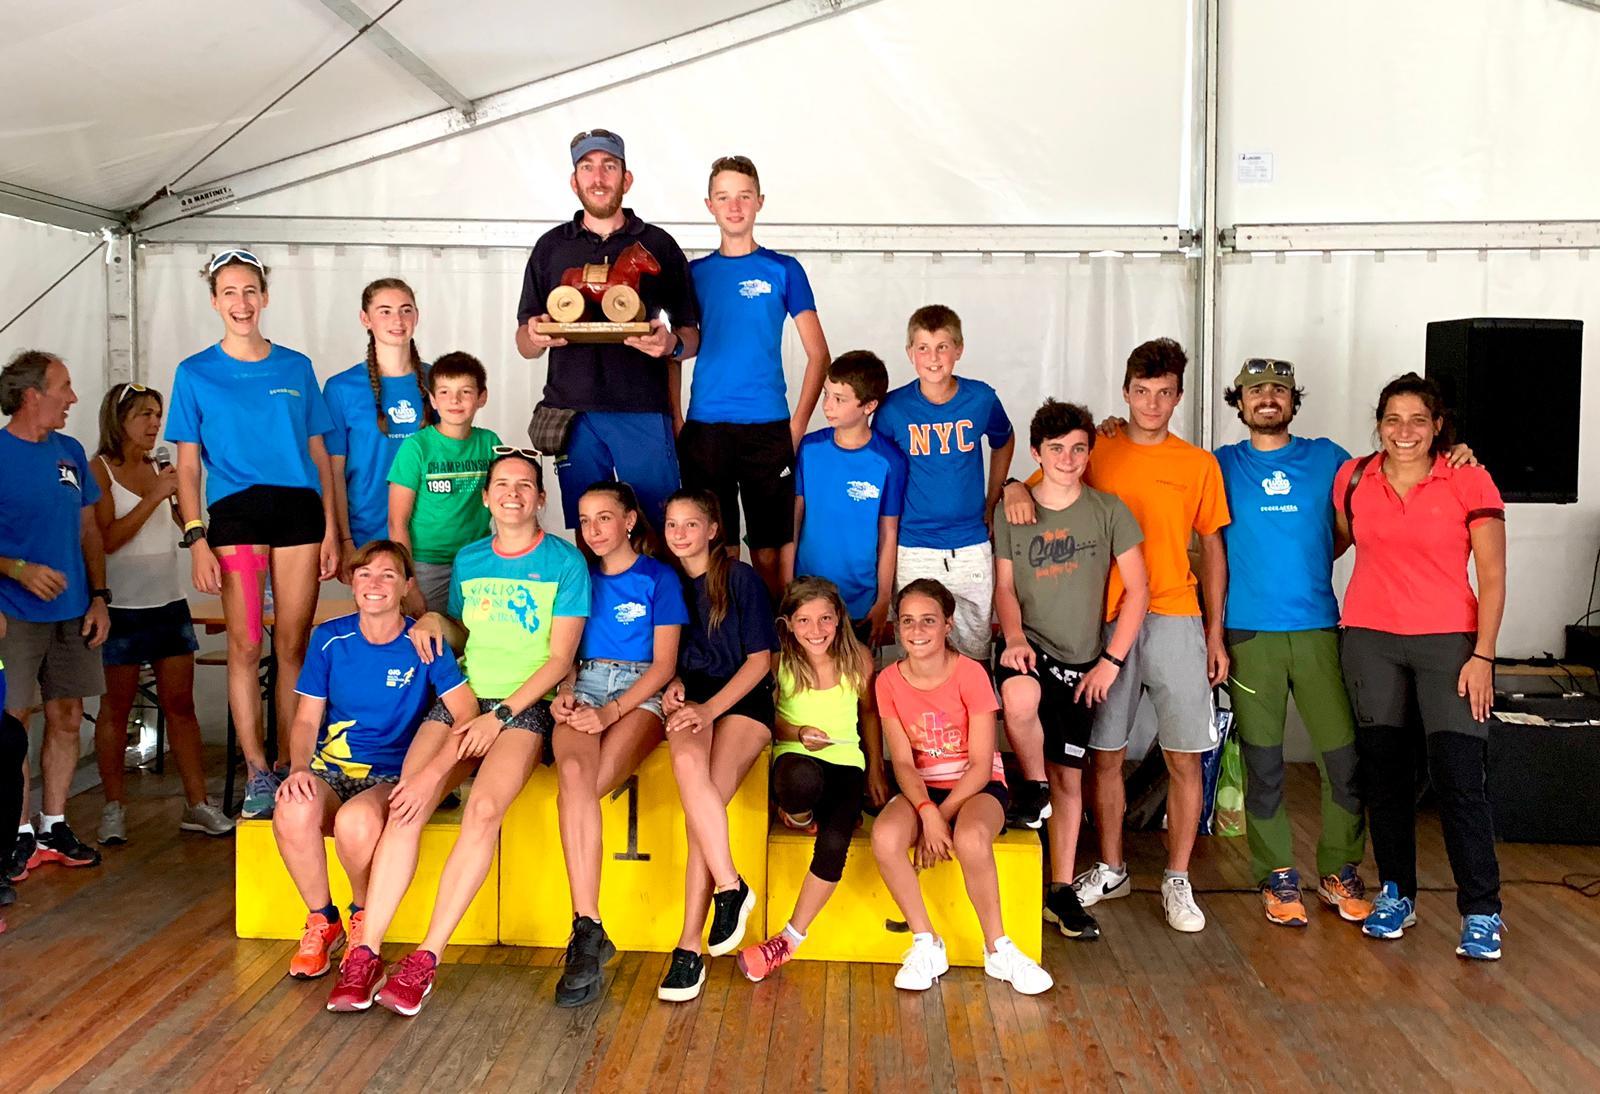 La Focolaccia trionfa nell'ottavo trofeo Bionaz Oyace